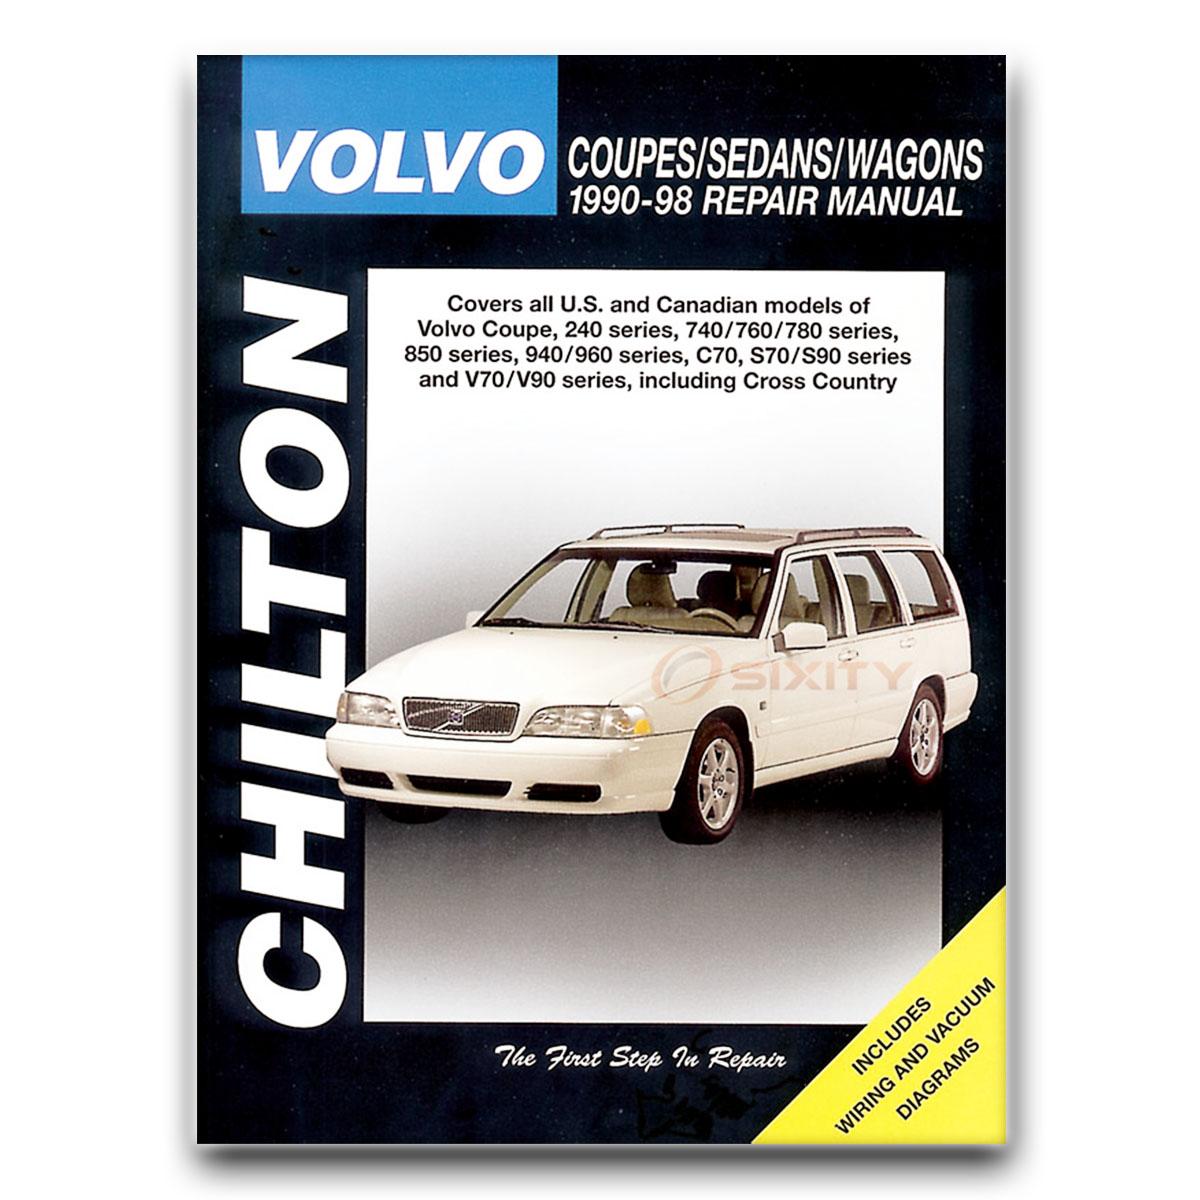 volvo 760 chilton repair manual base gle shop service garage book nx rh ebay com volvo 760 gle service manual 760 Volvo Rear End